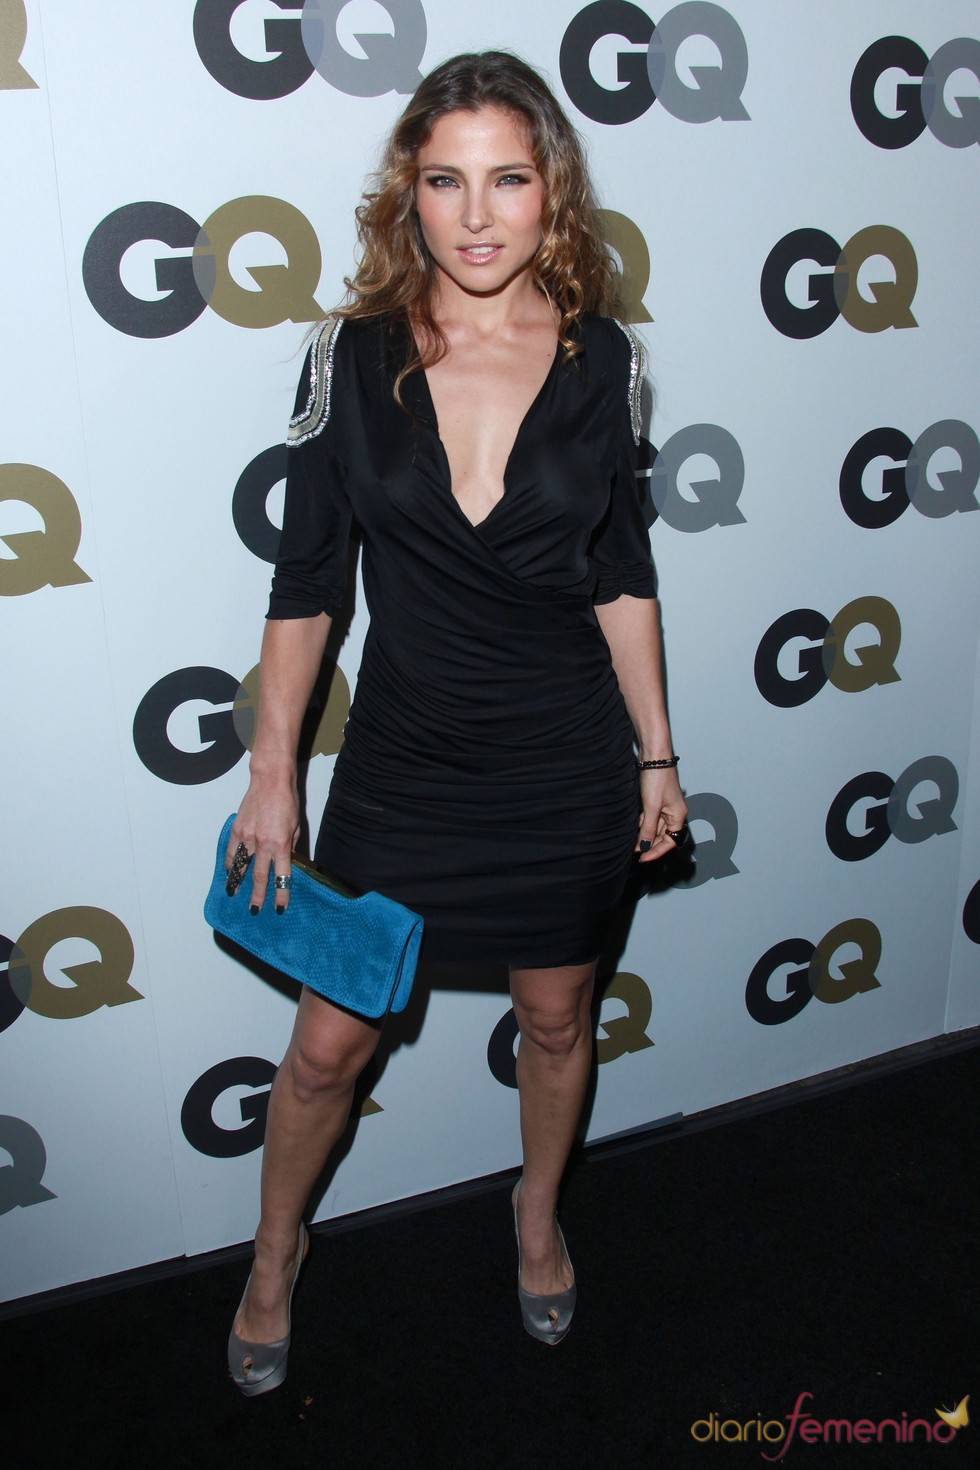 Elsa Pataky en la Fiesta GQ 2010